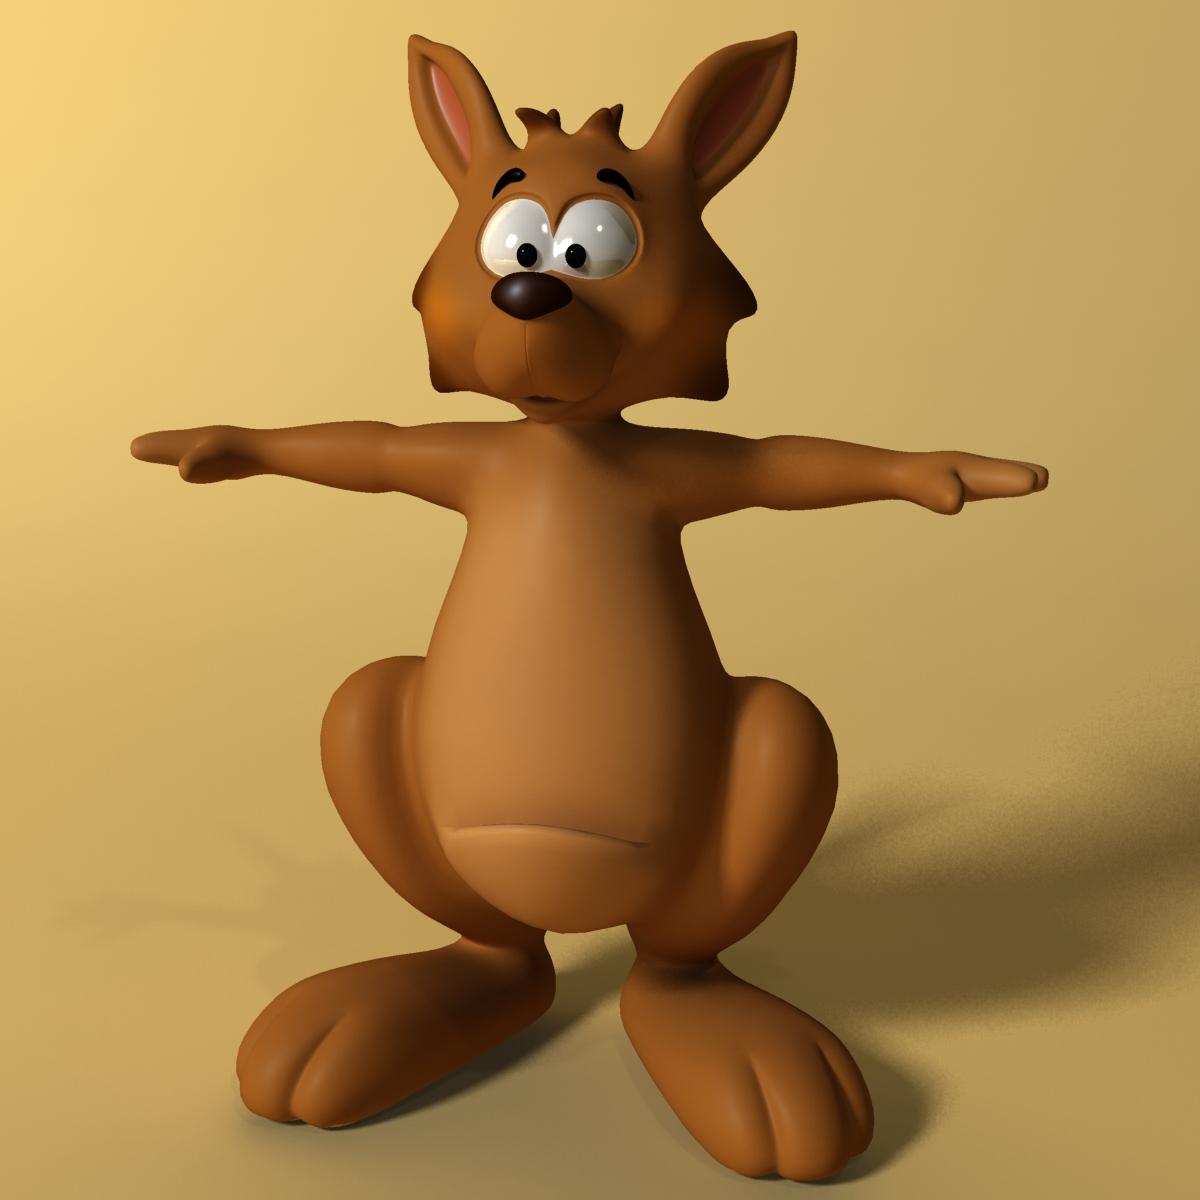 cartoon kangaroo rigged and animated 3d model max fbx  obj 220168